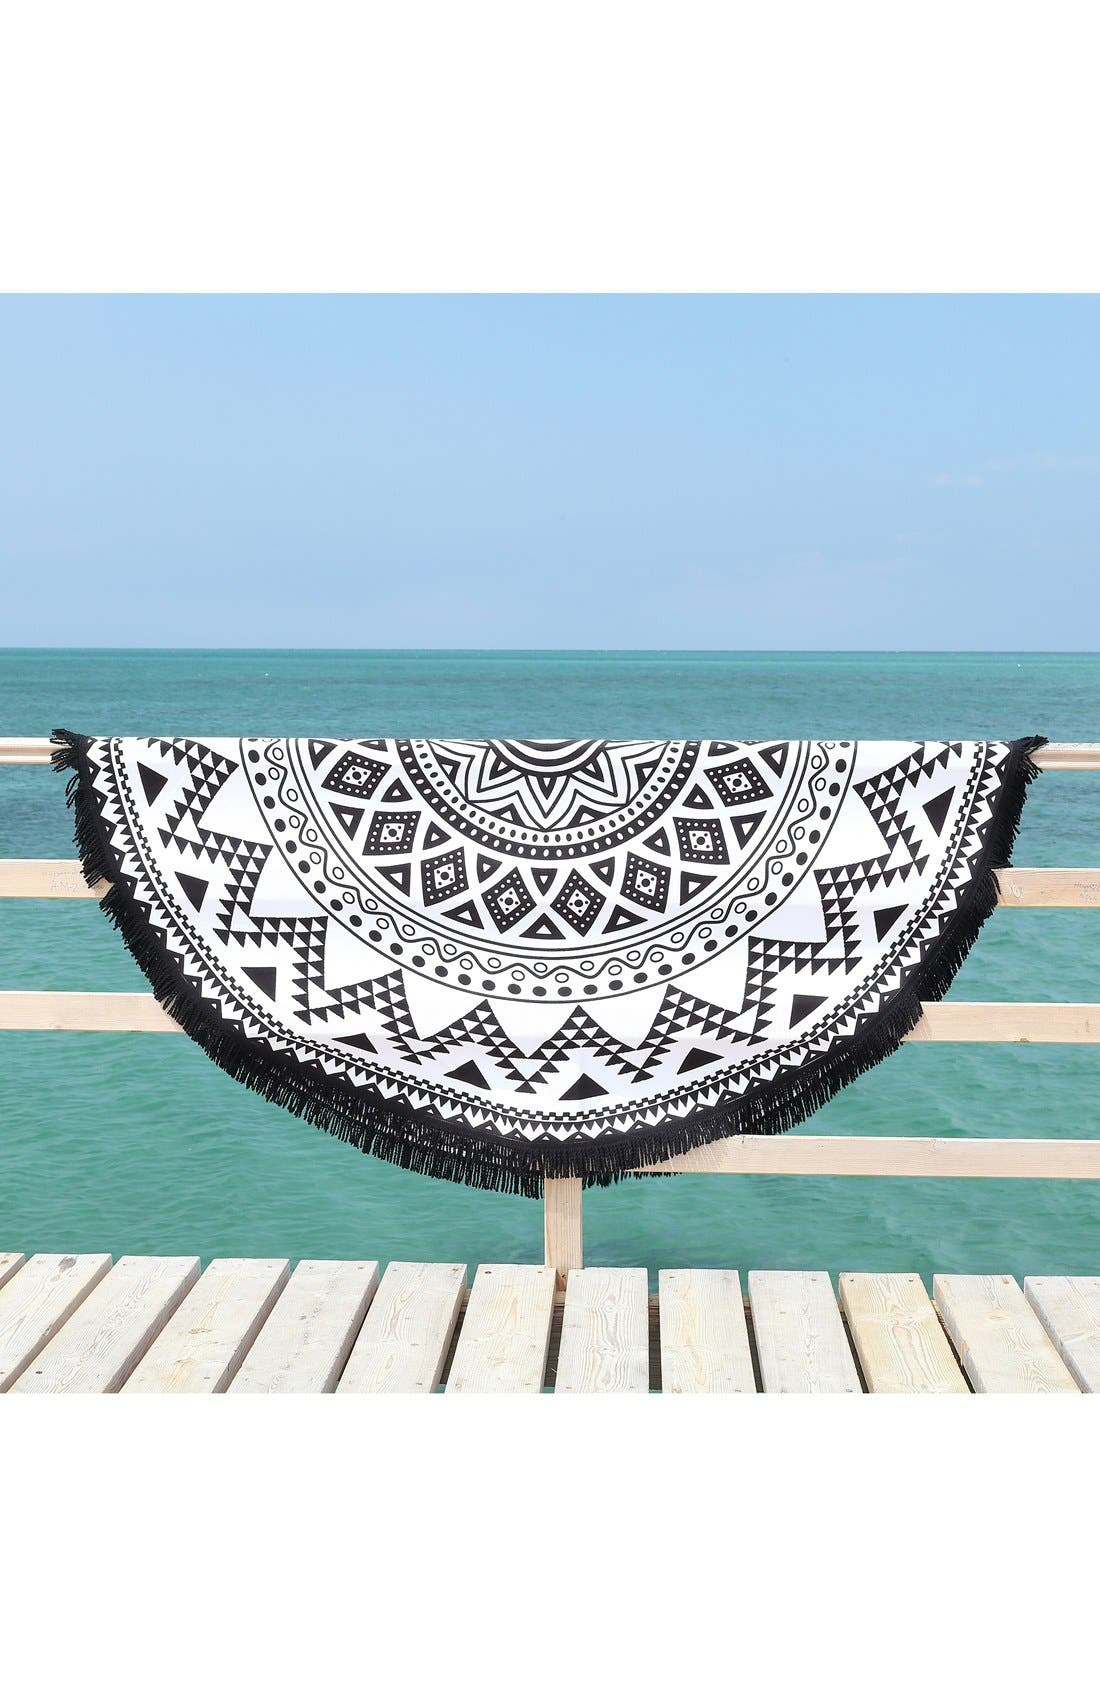 'Kilim' Turkish Pestemal Round Beach Towel,                             Alternate thumbnail 3, color,                             BLACK/ WHITE